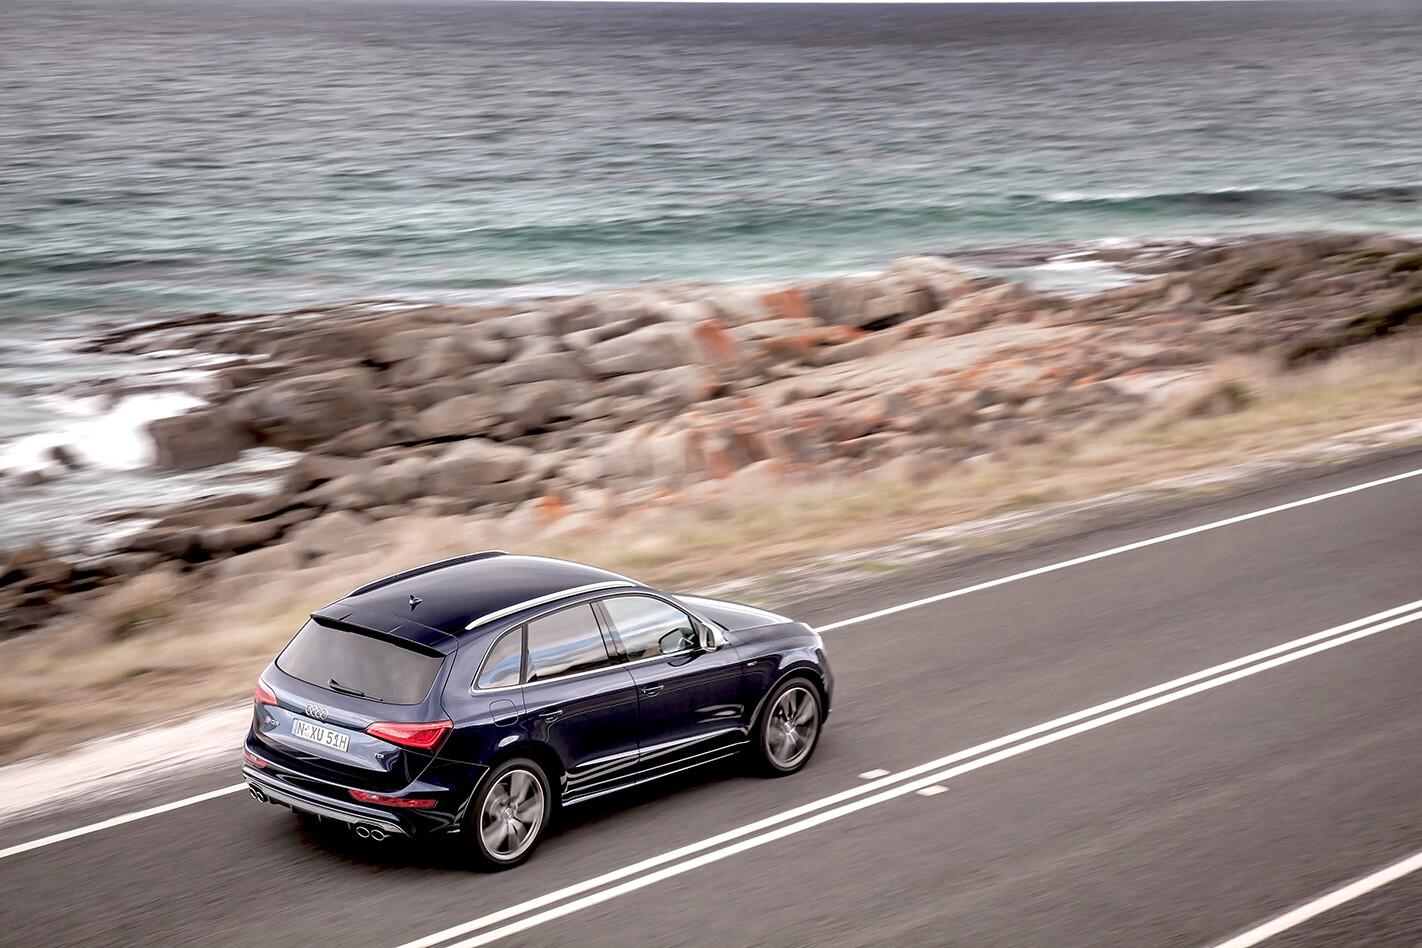 Audi SQ5 on road.jpg